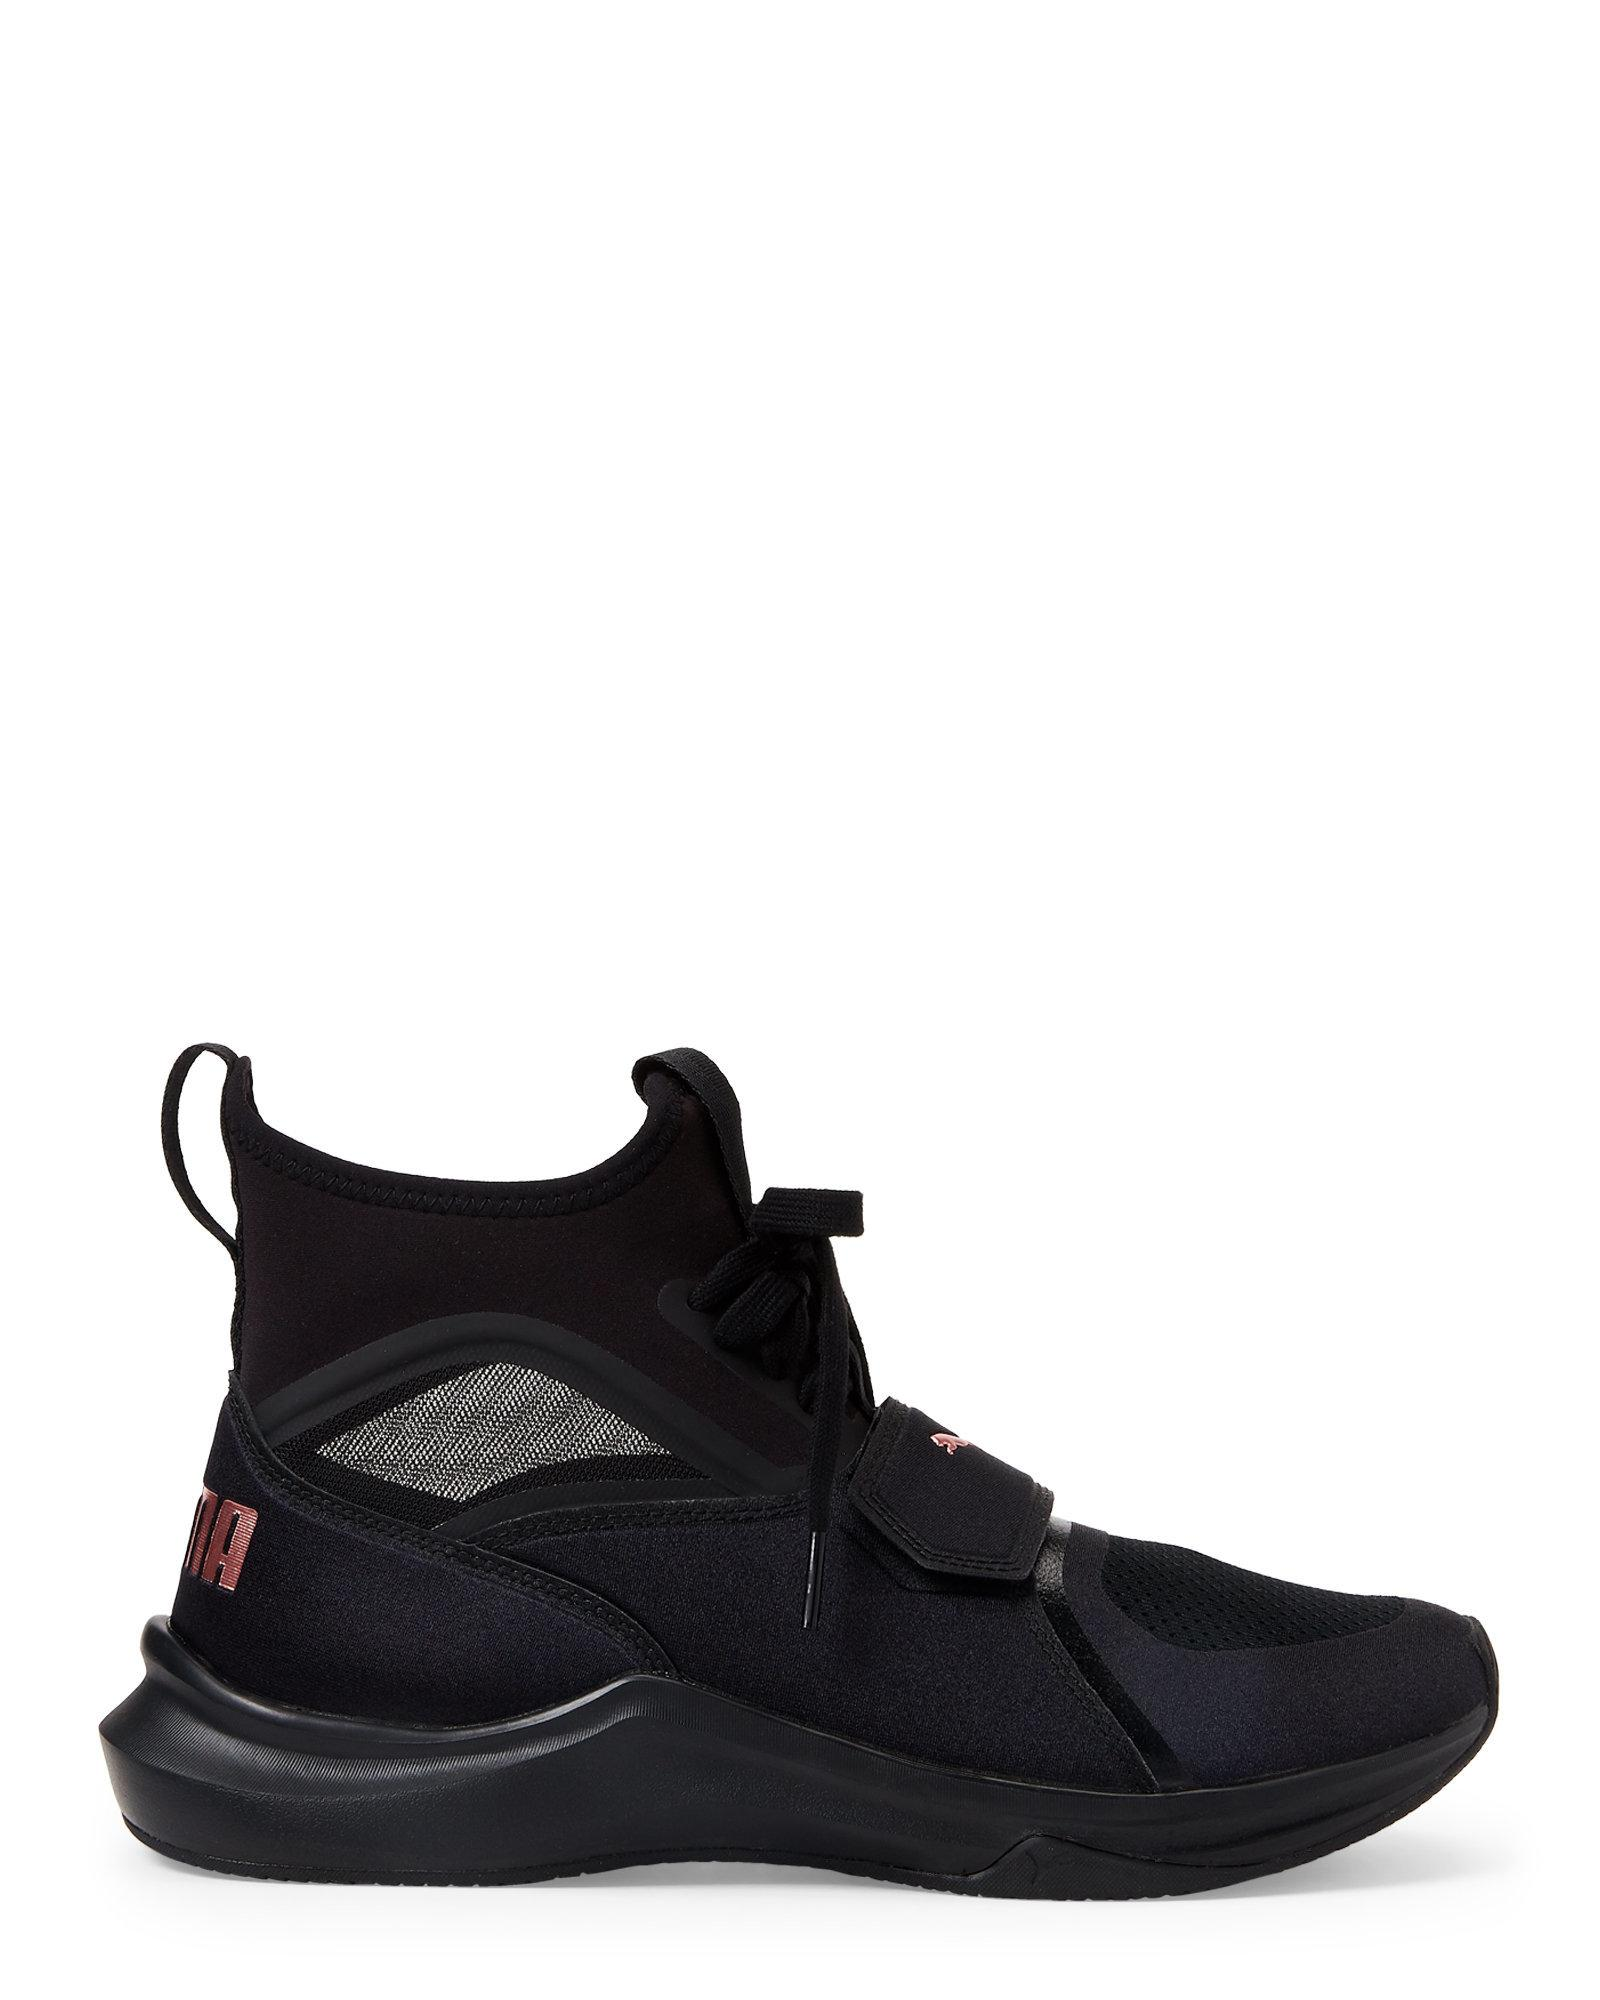 4fd46be927e7 PUMA Black   Rose Gold Phenom Training Sneakers in Black for Men - Lyst